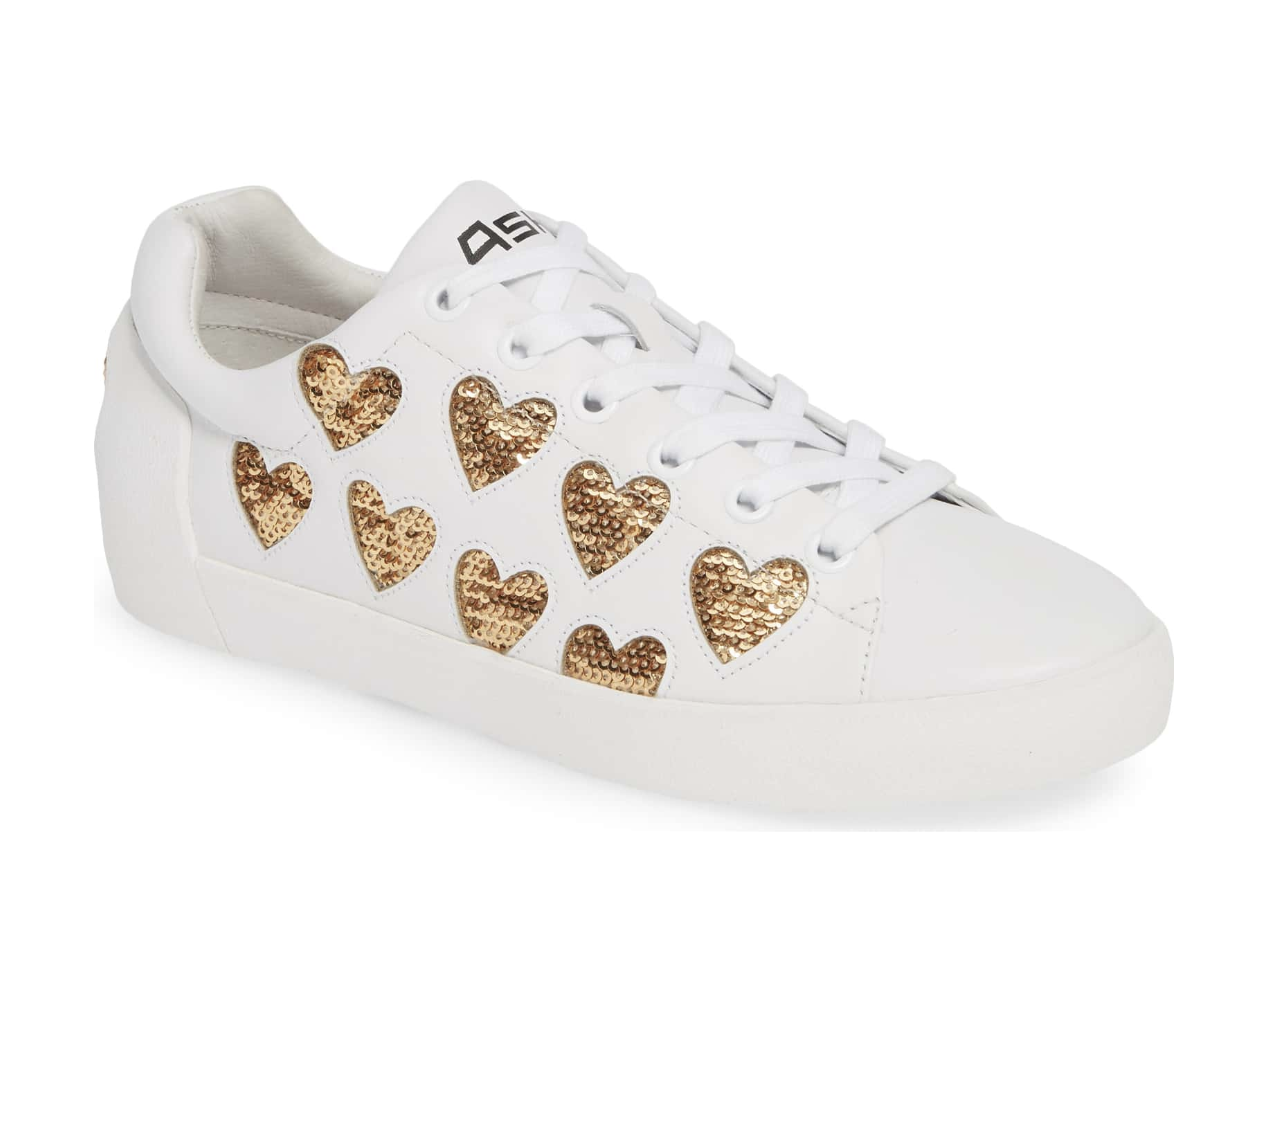 Ash Nikita Sequin Hearts Sneakers